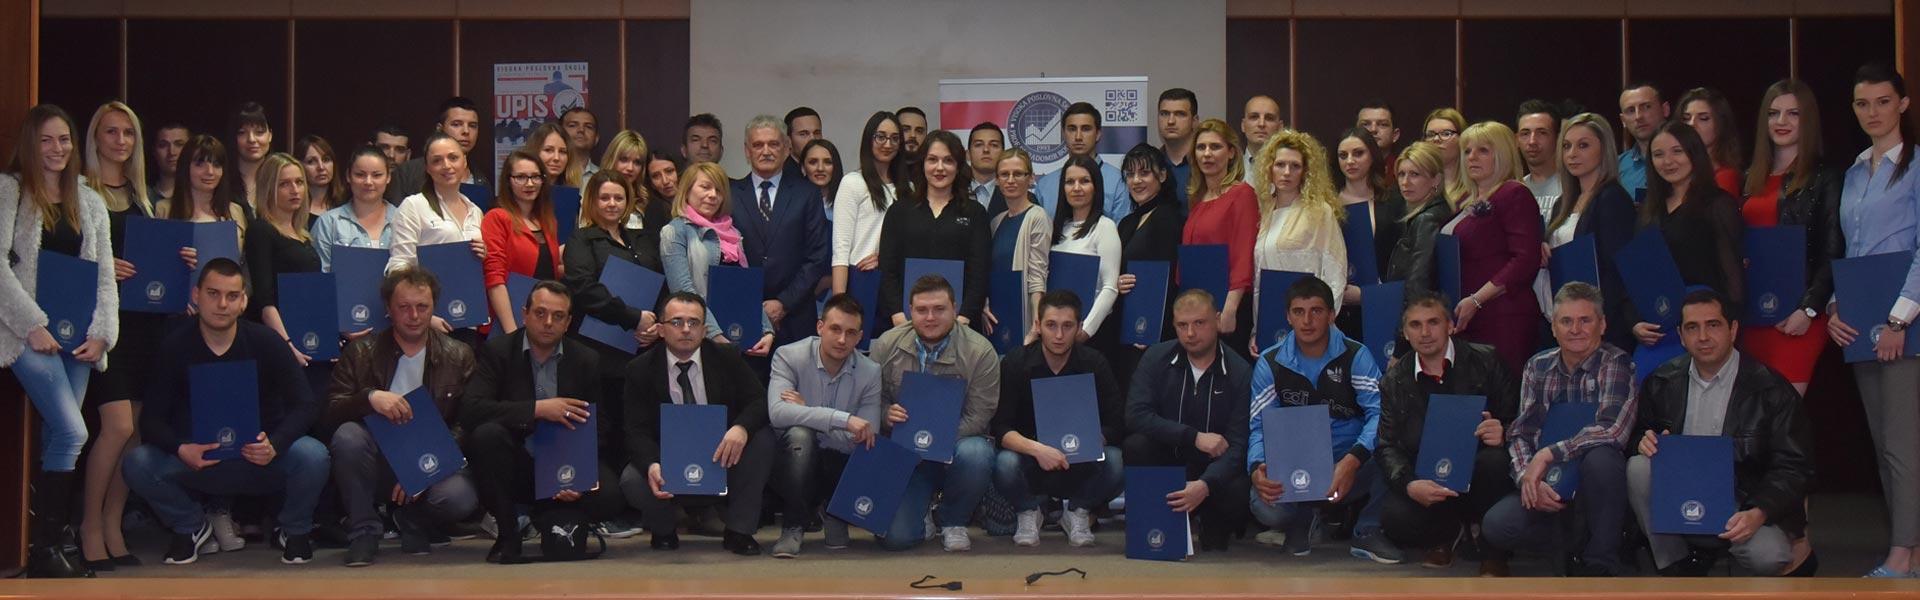 21-generacija-visoka-poslovna-skola-strukovnih-studija-krusevac